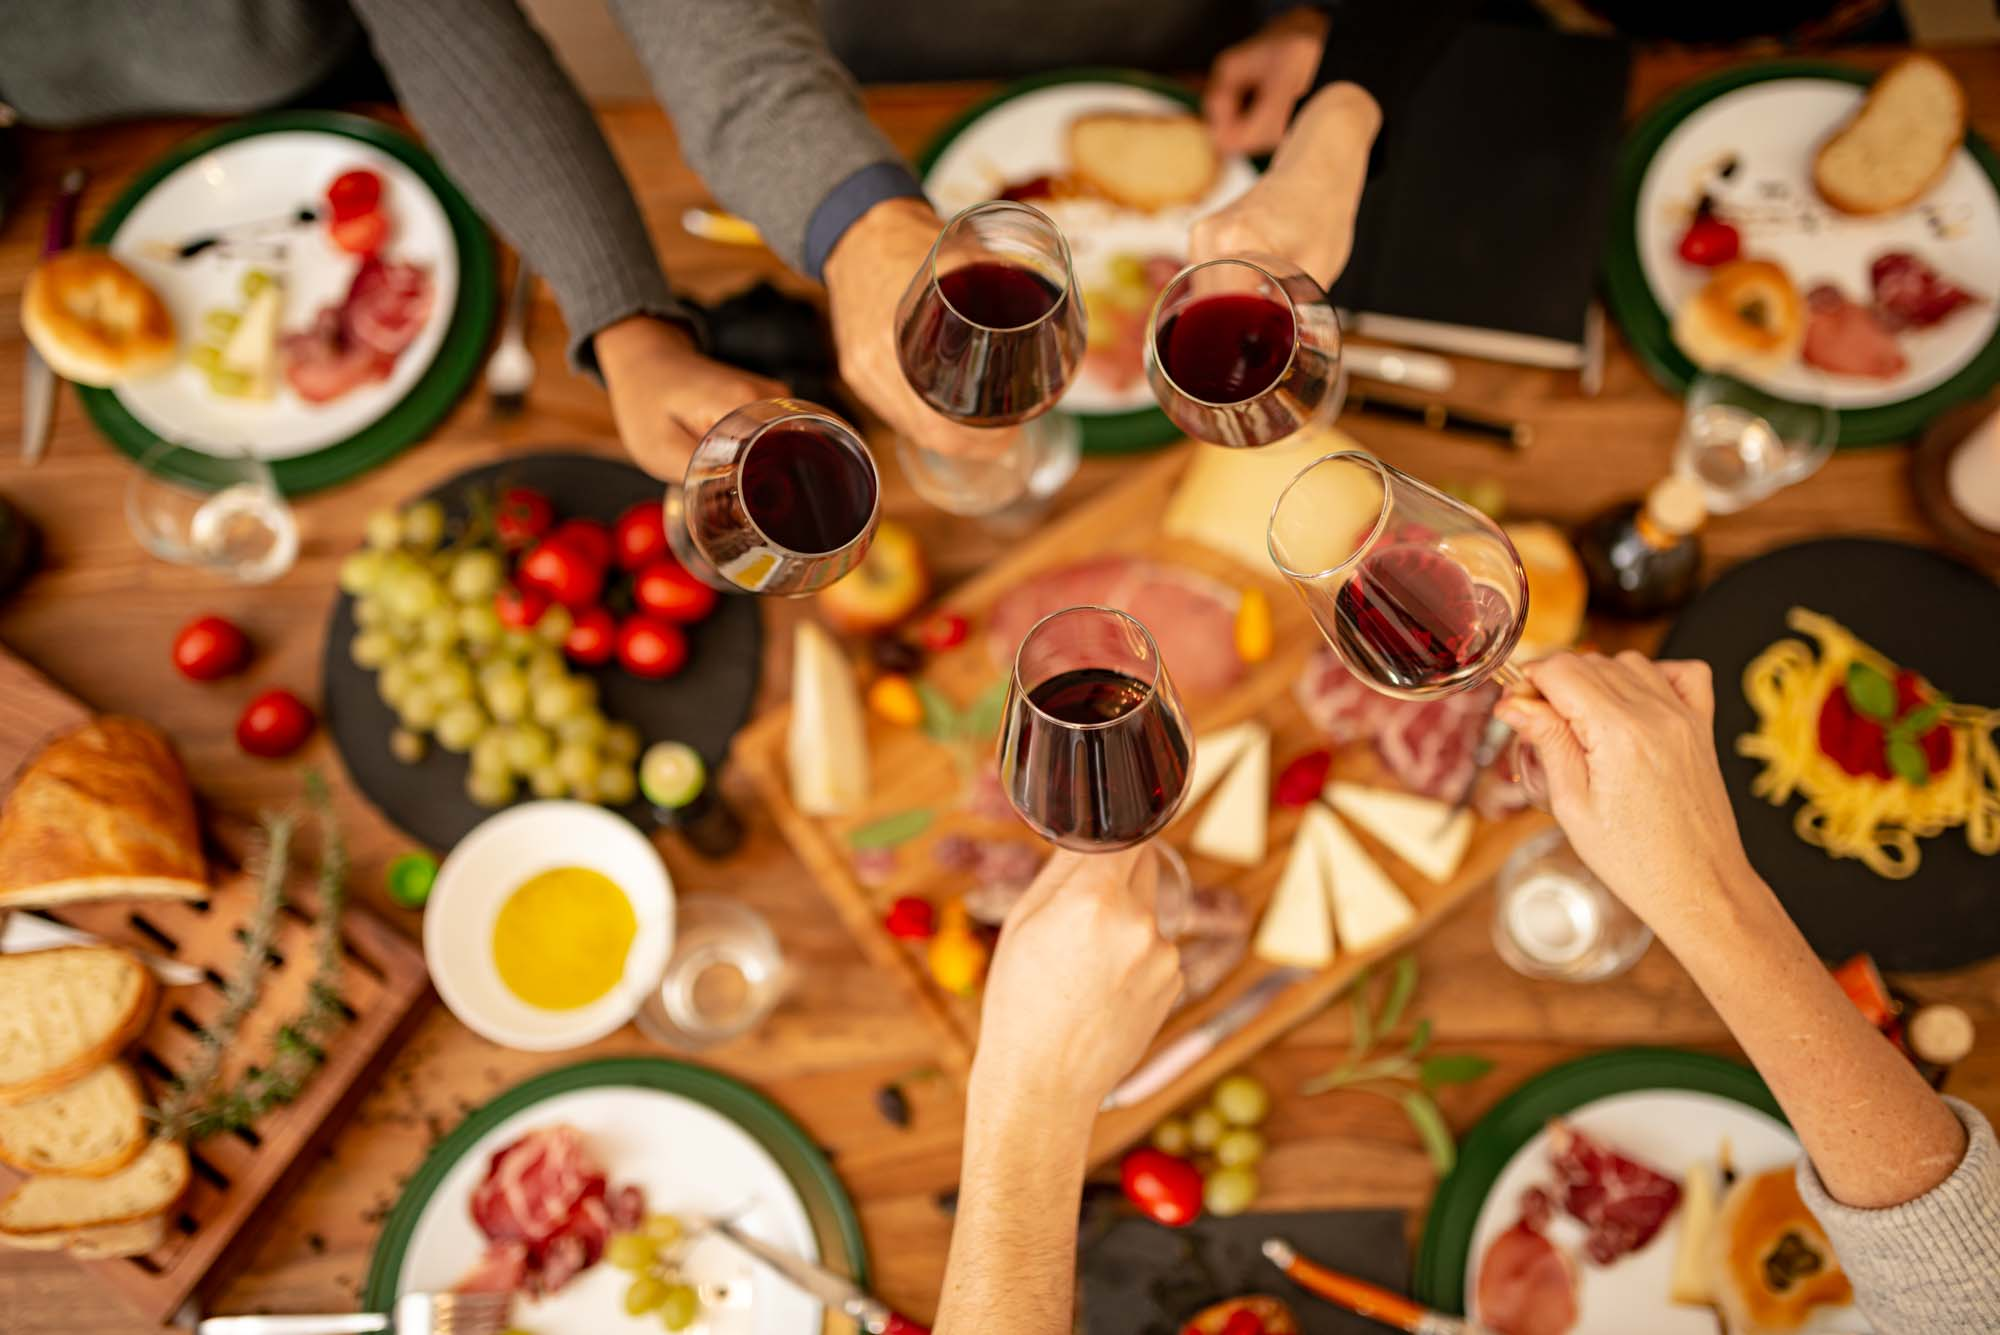 Cucina Amatoriale Eventi Aziendali a Palermo